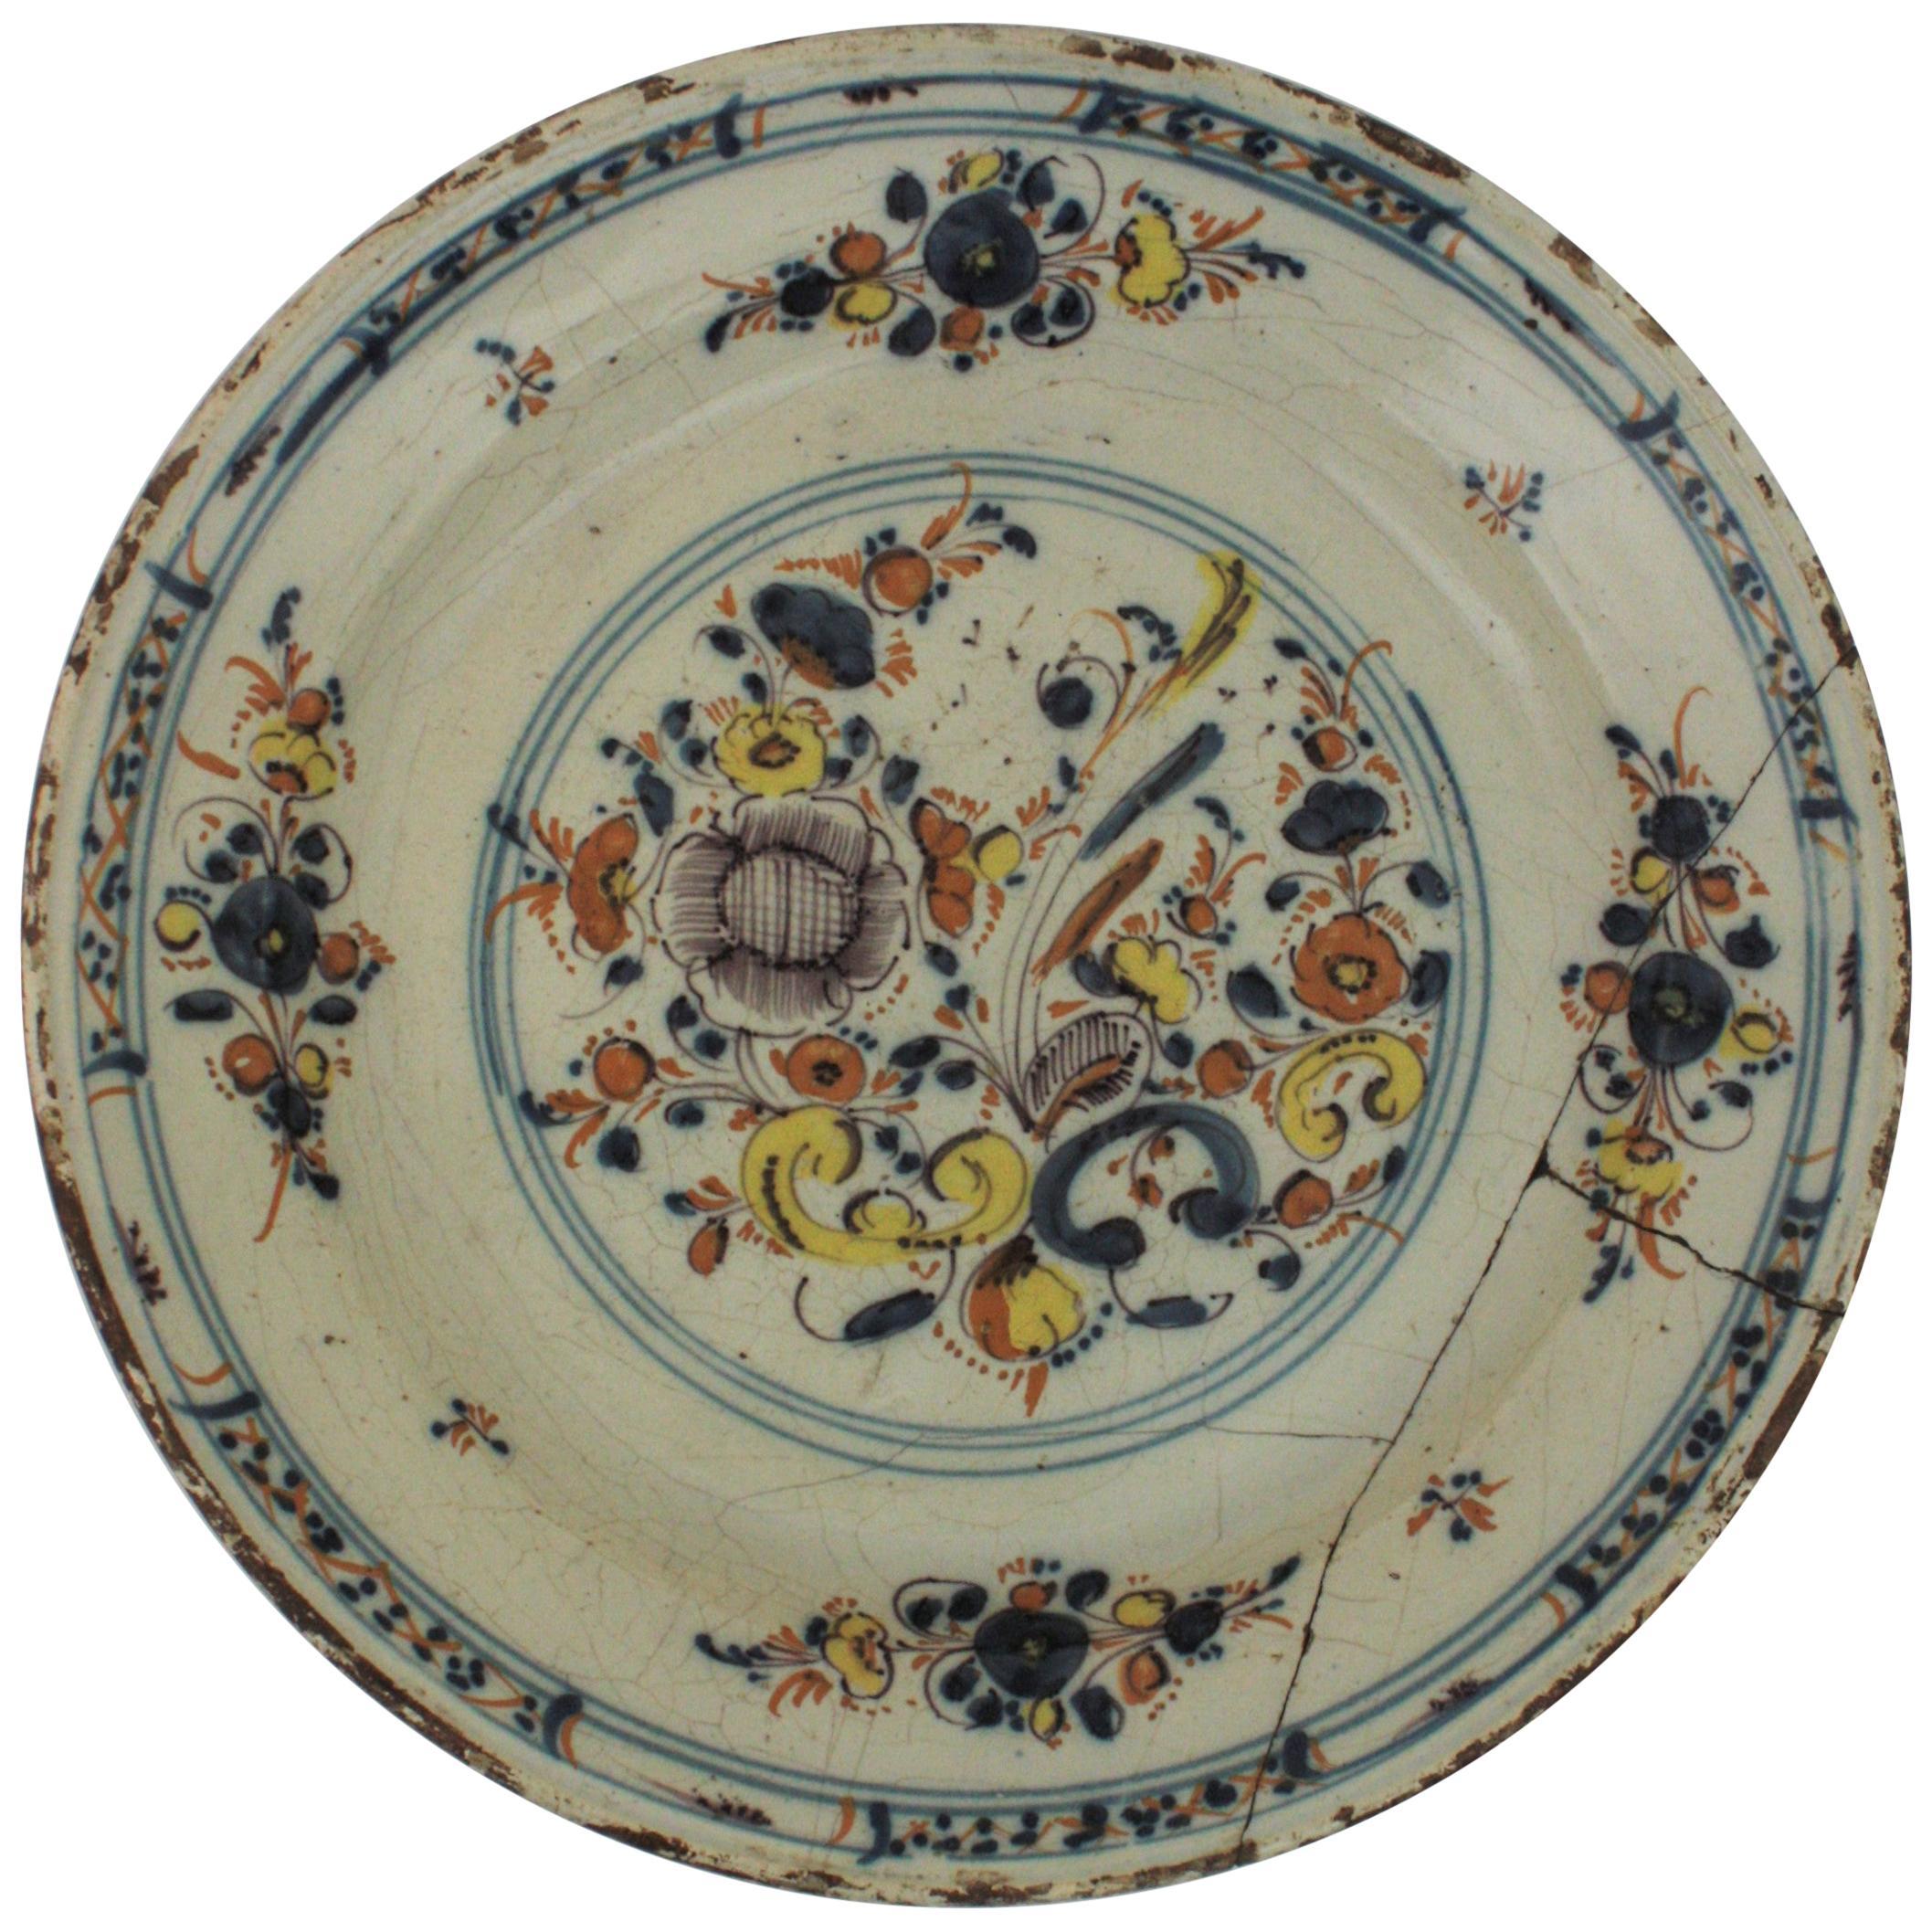 Spanish 17th Century Ceramic Circular Charger Plate, Talavera or Puente